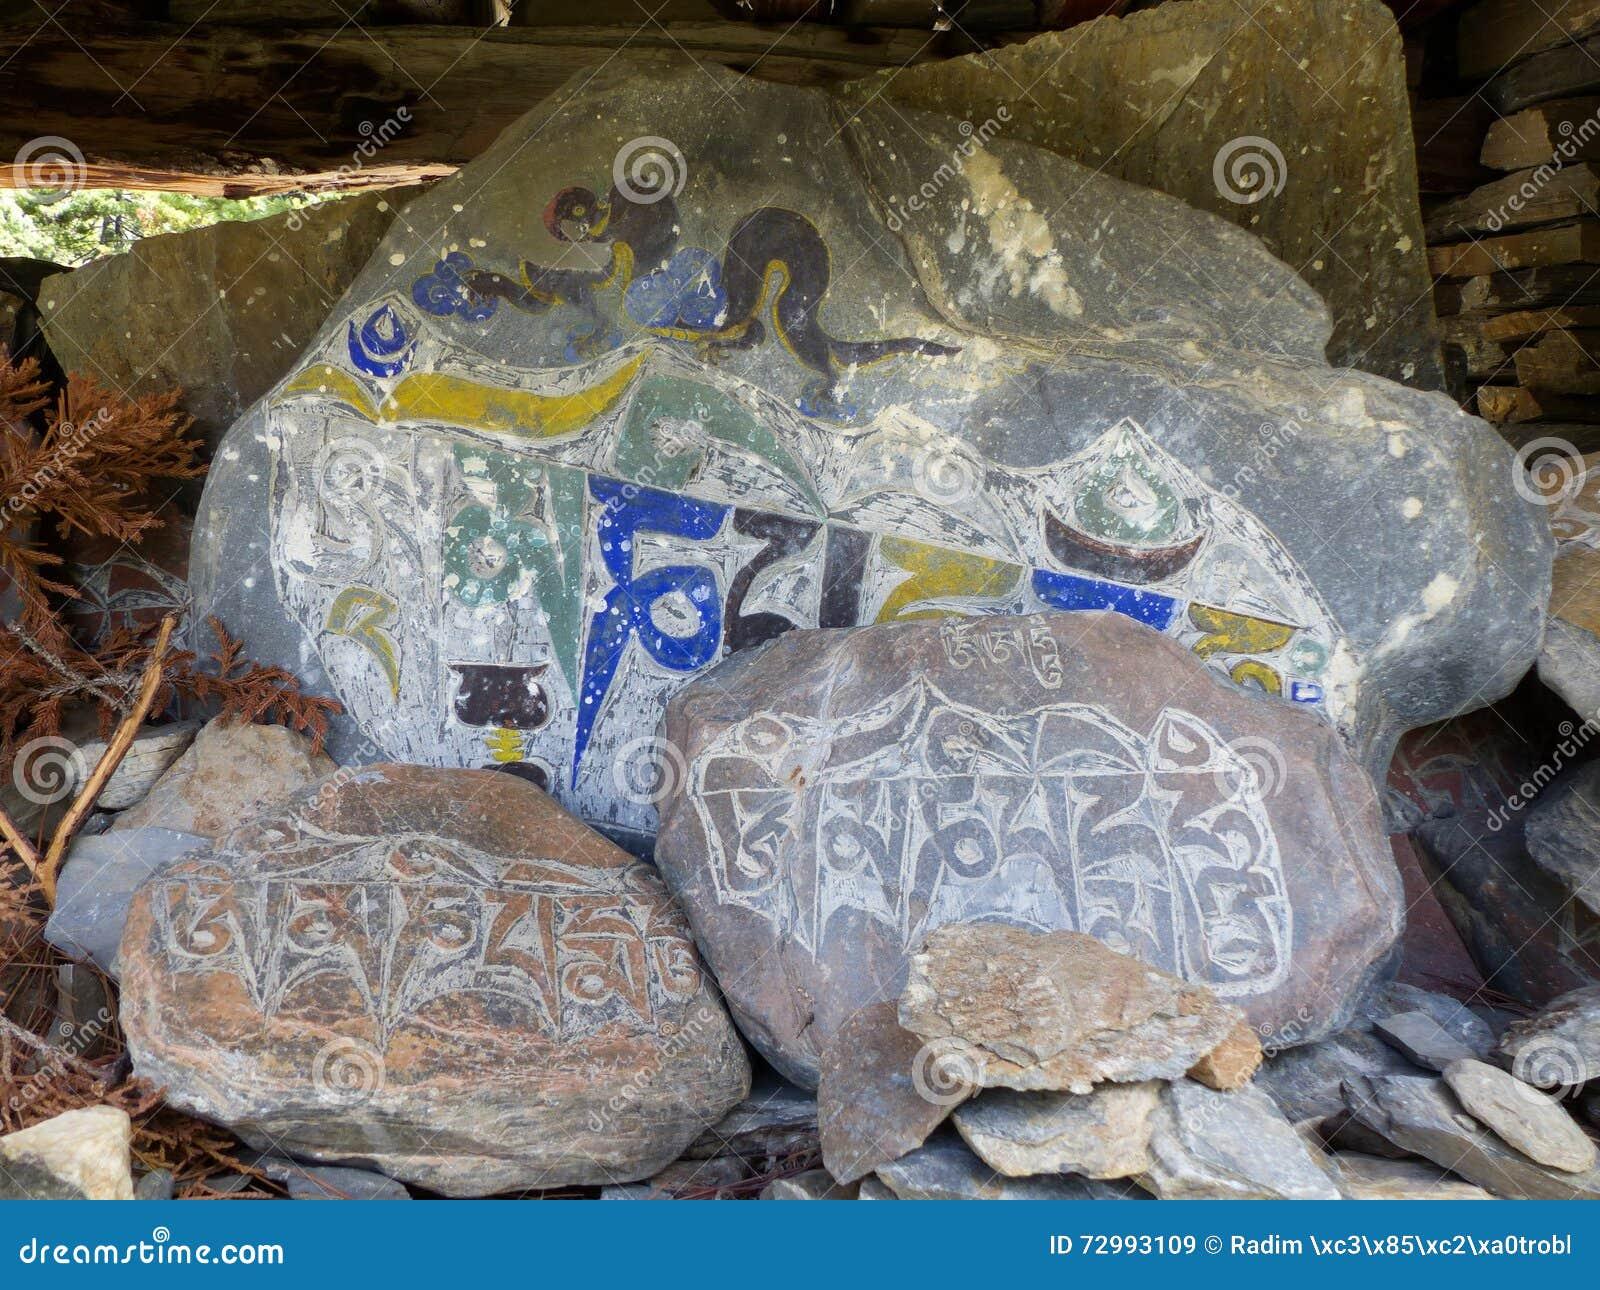 Stone mantra stock image  Image of annapurna, asia, nepalese